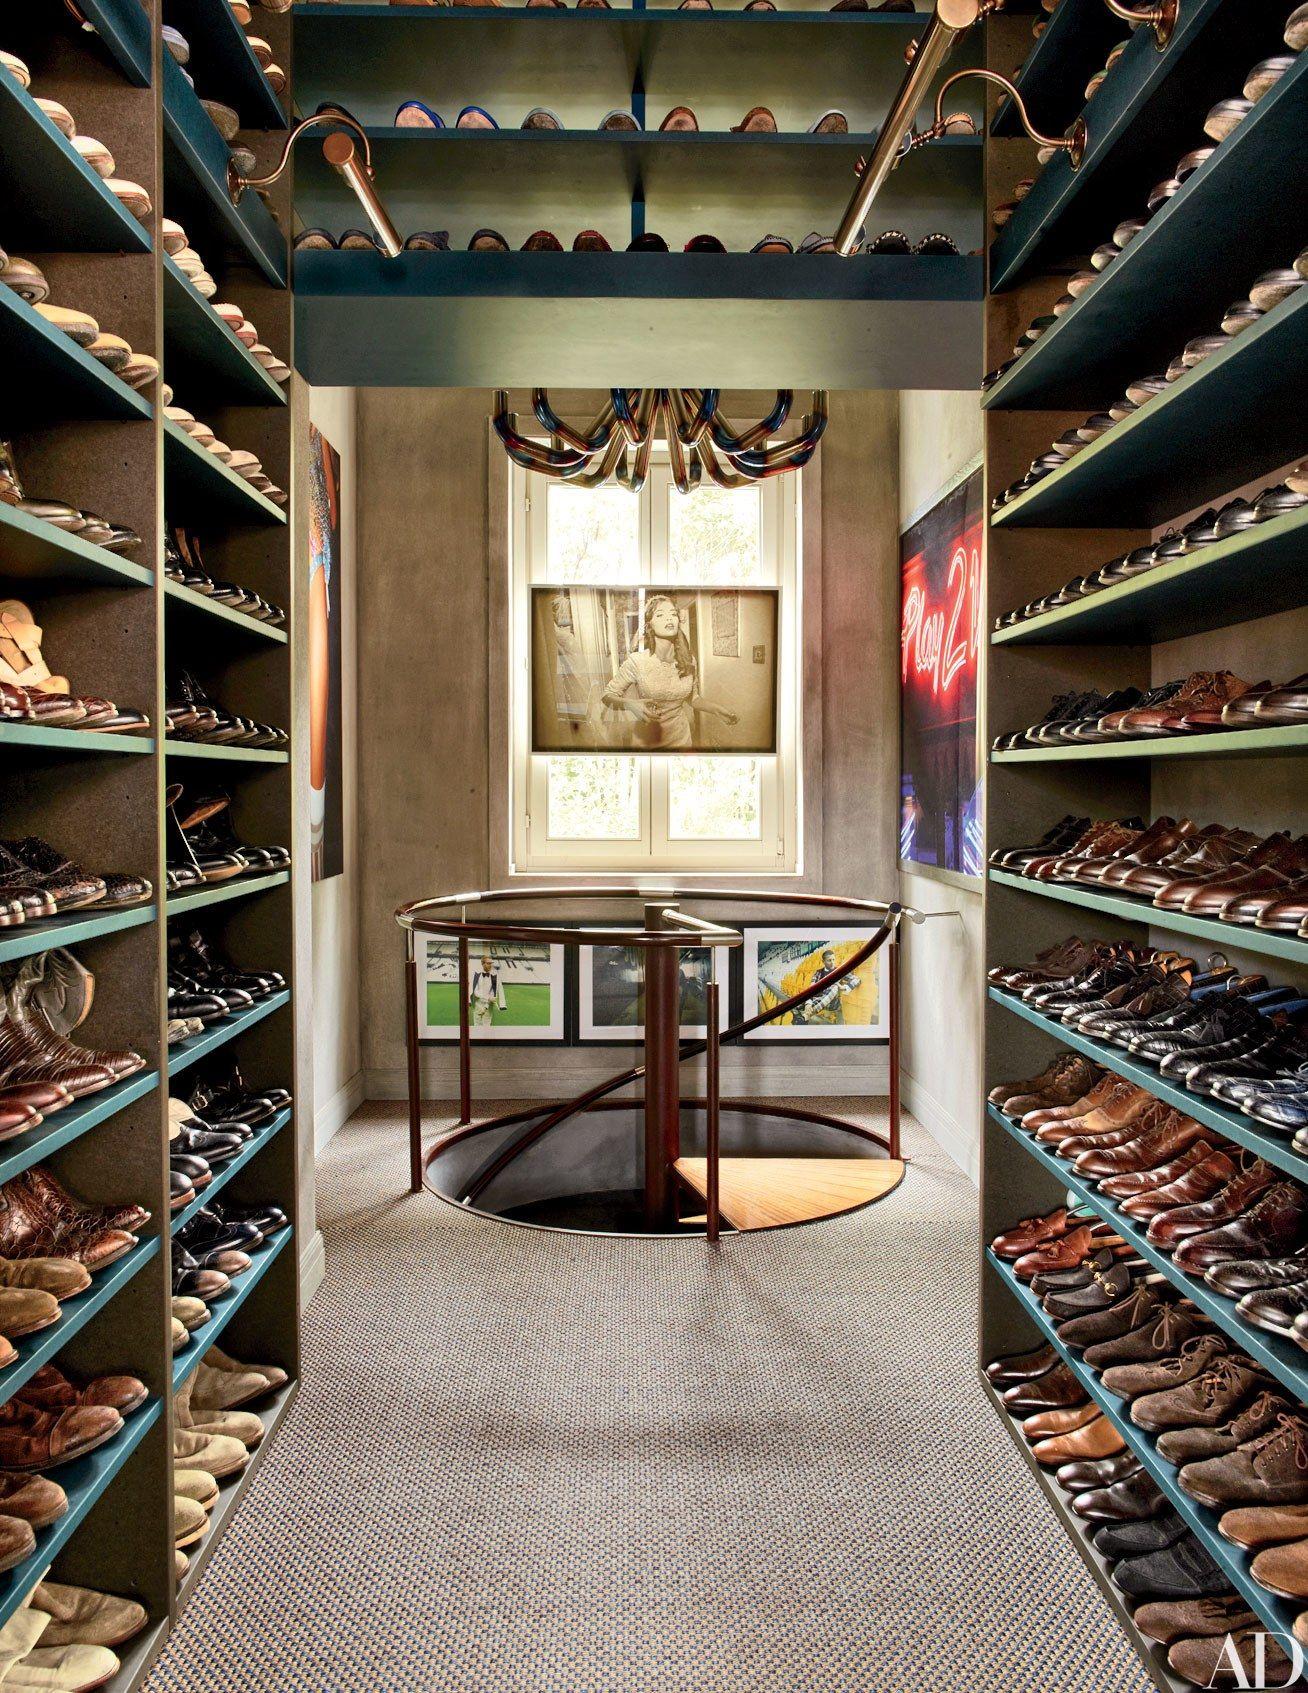 11 Ingenious Shoe Storage Ideas